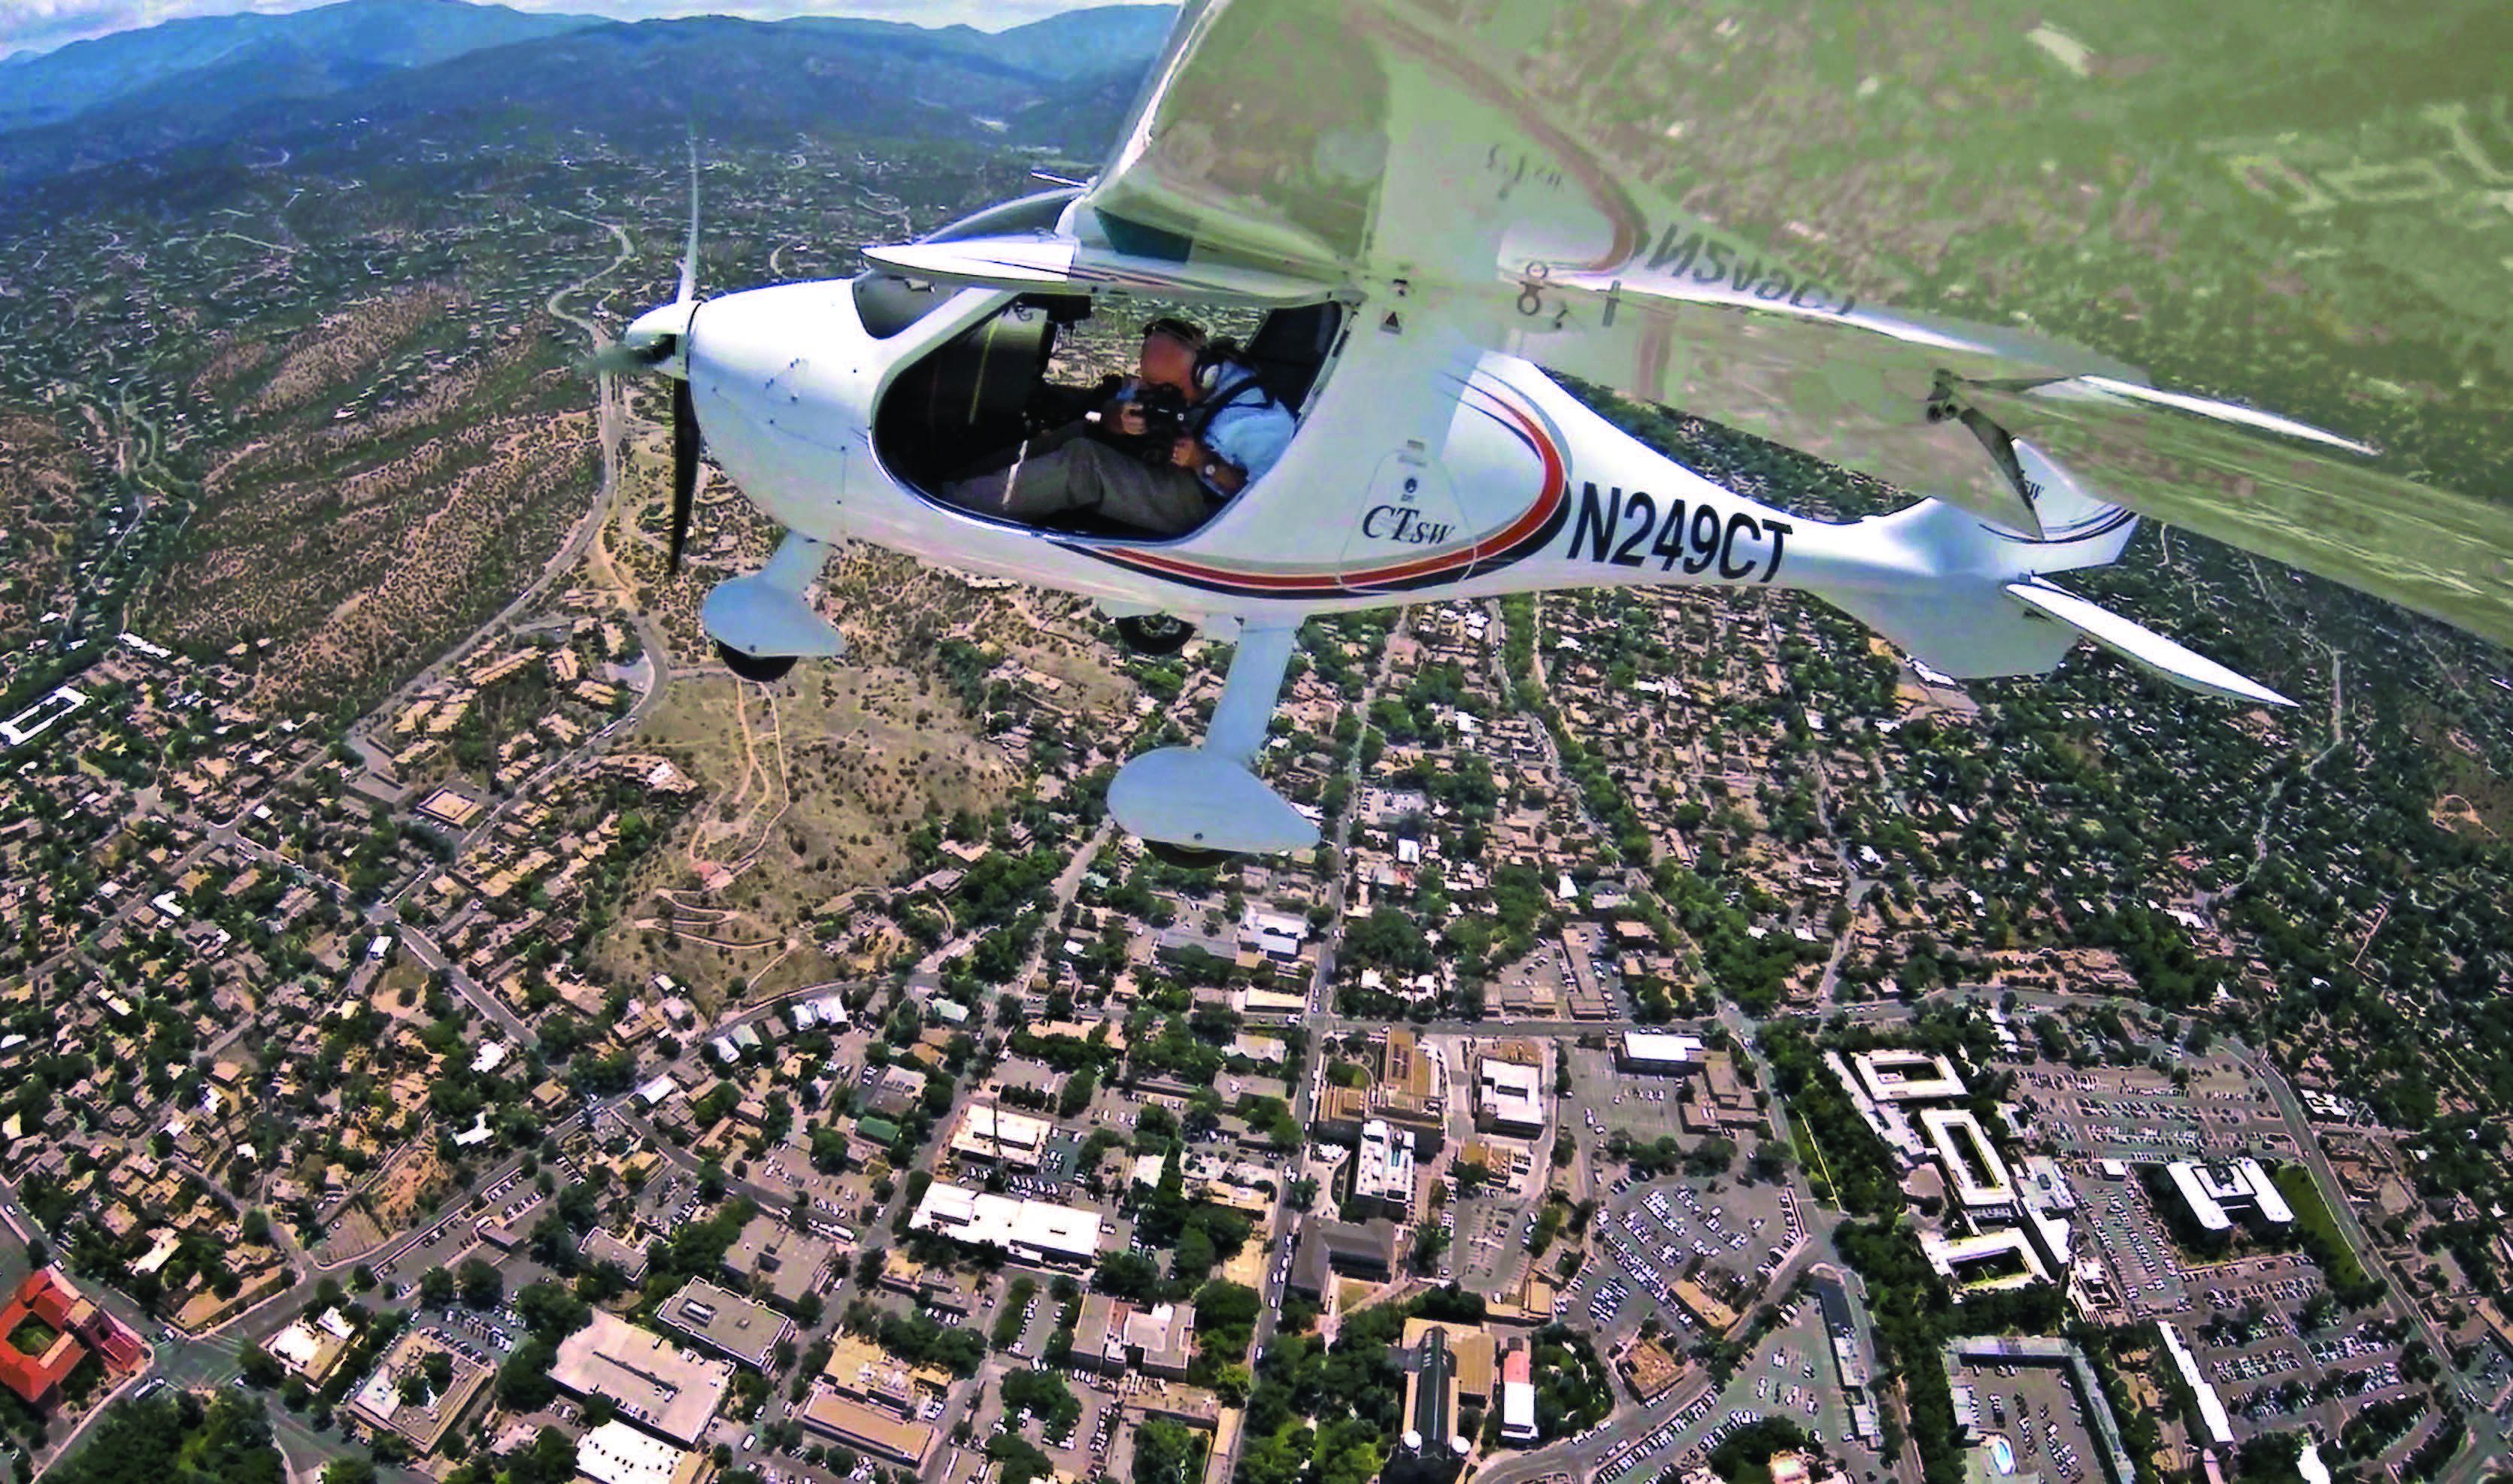 Adriel Heisey in flight over Santa Fe, 2015. Photograph by Adriel Heisey.